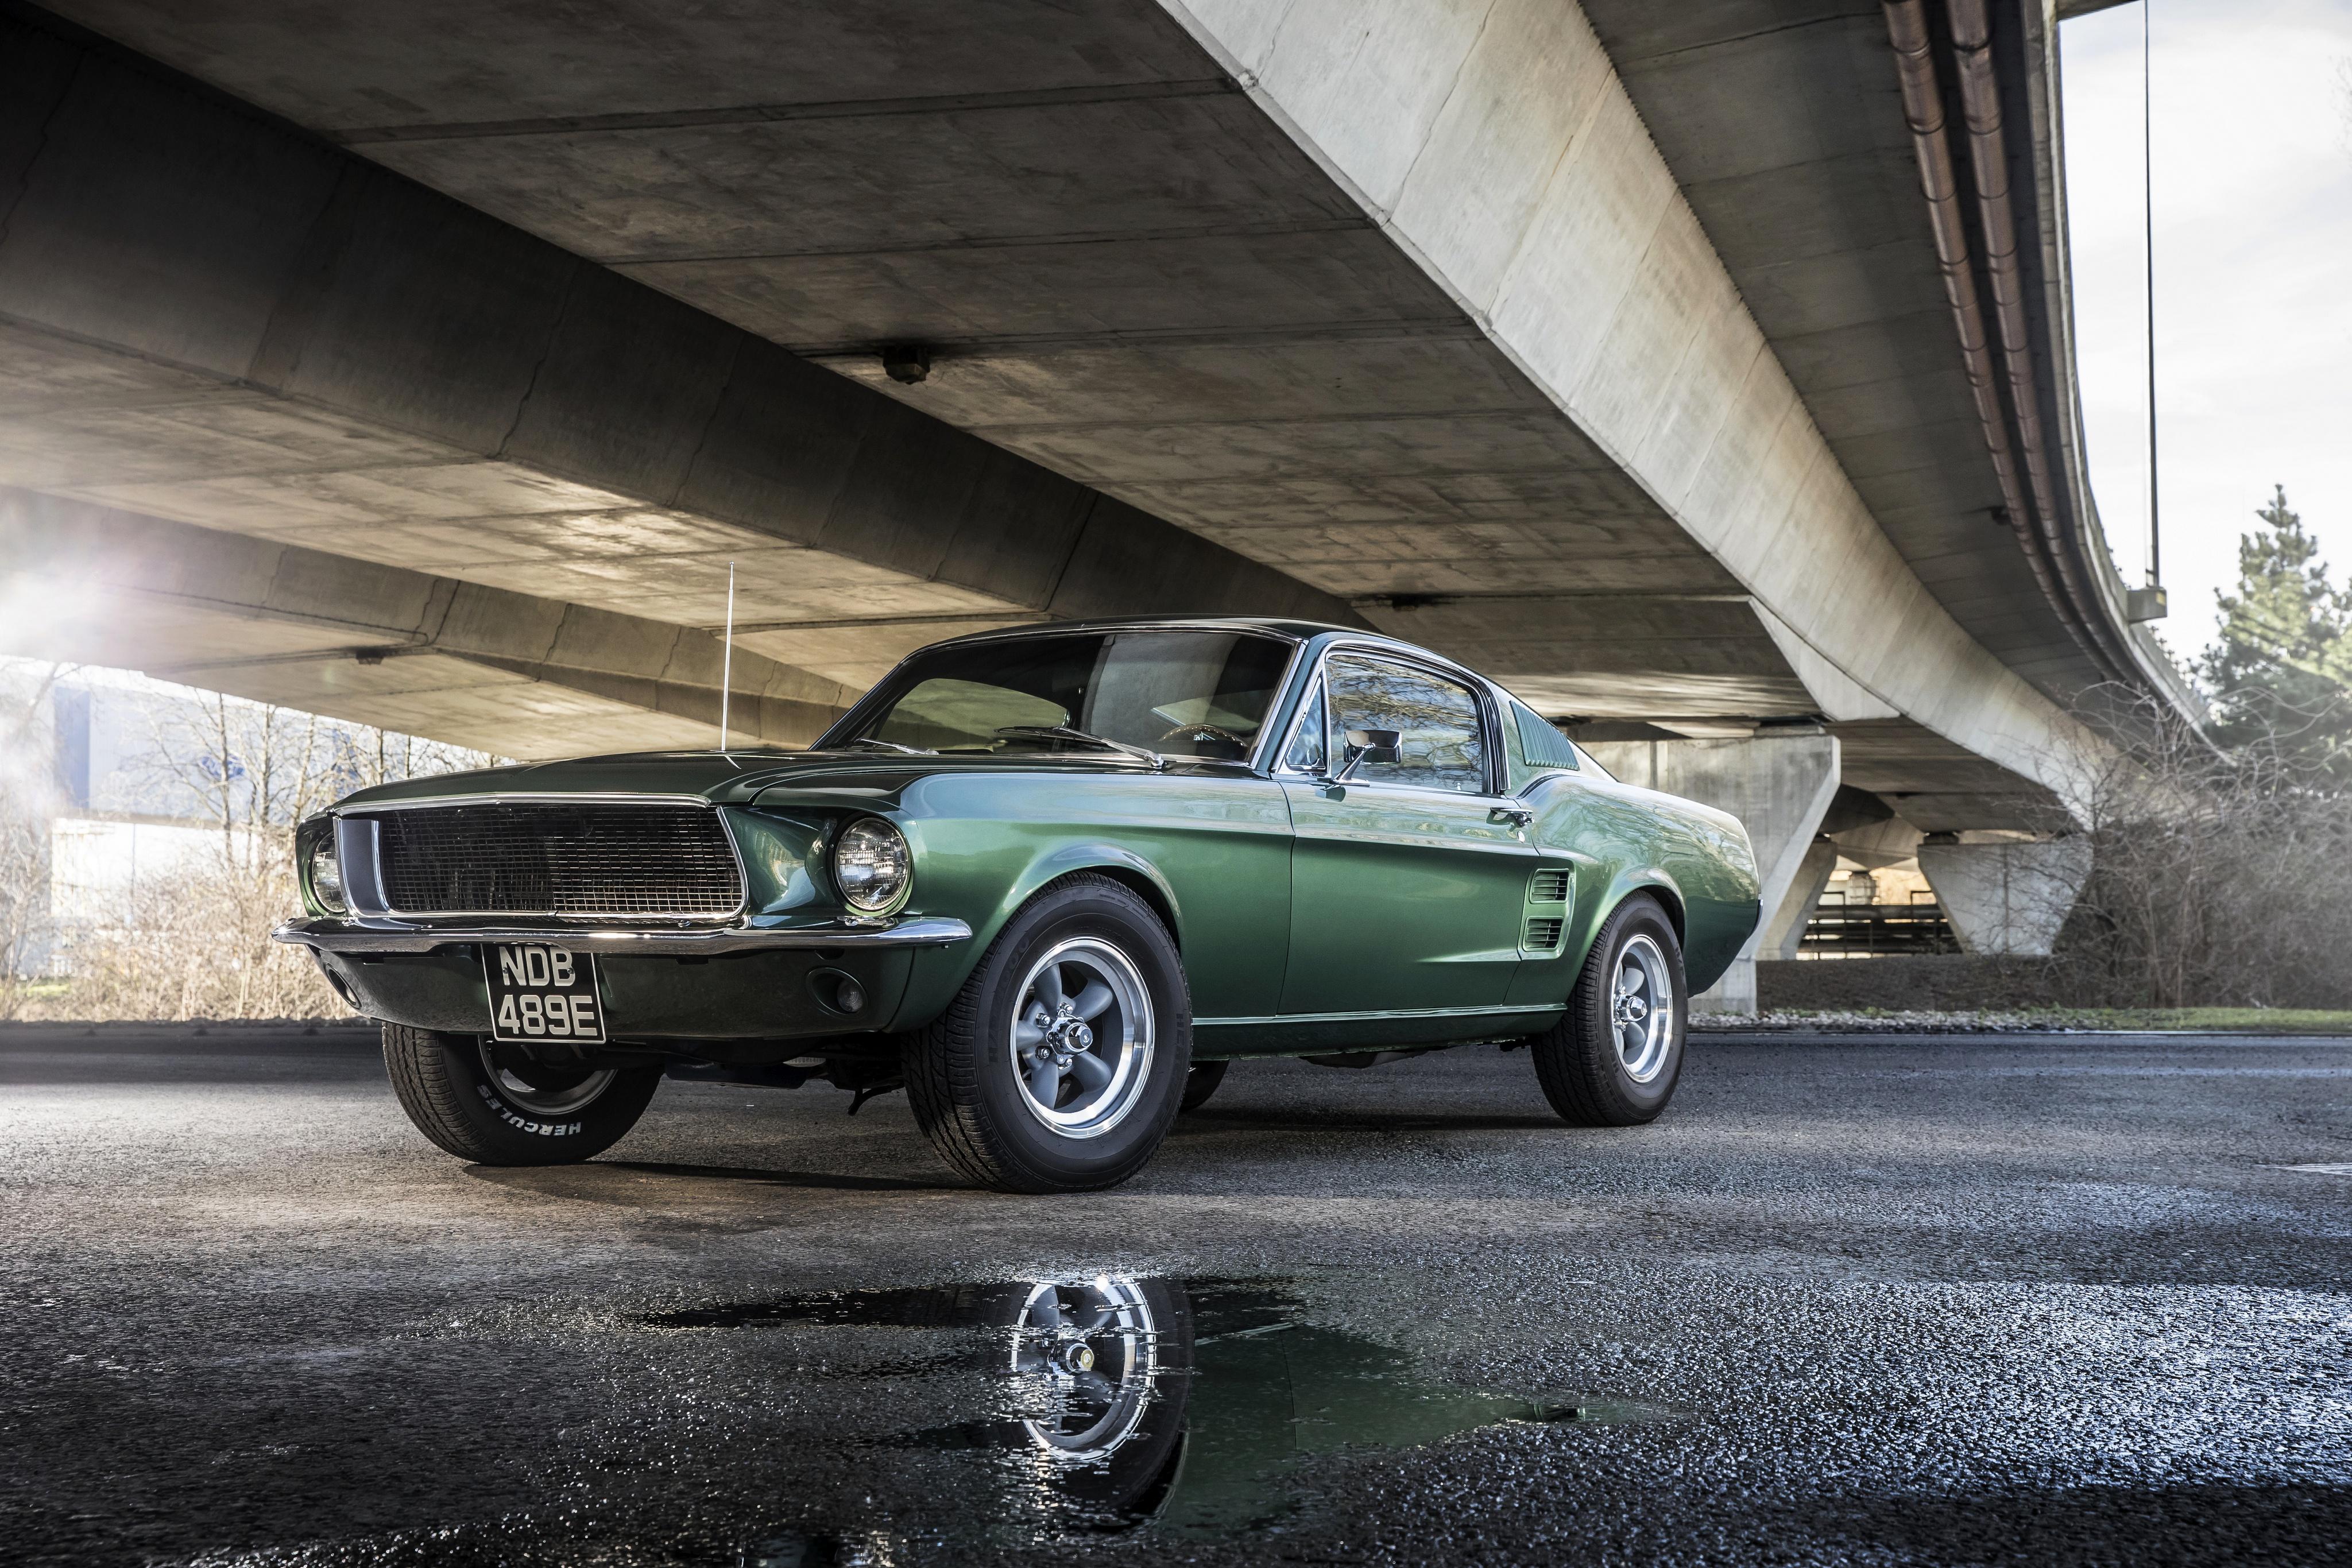 Ford Mustang Bullitt 4k Ultra HD Wallpaper Background Image 4096x2731